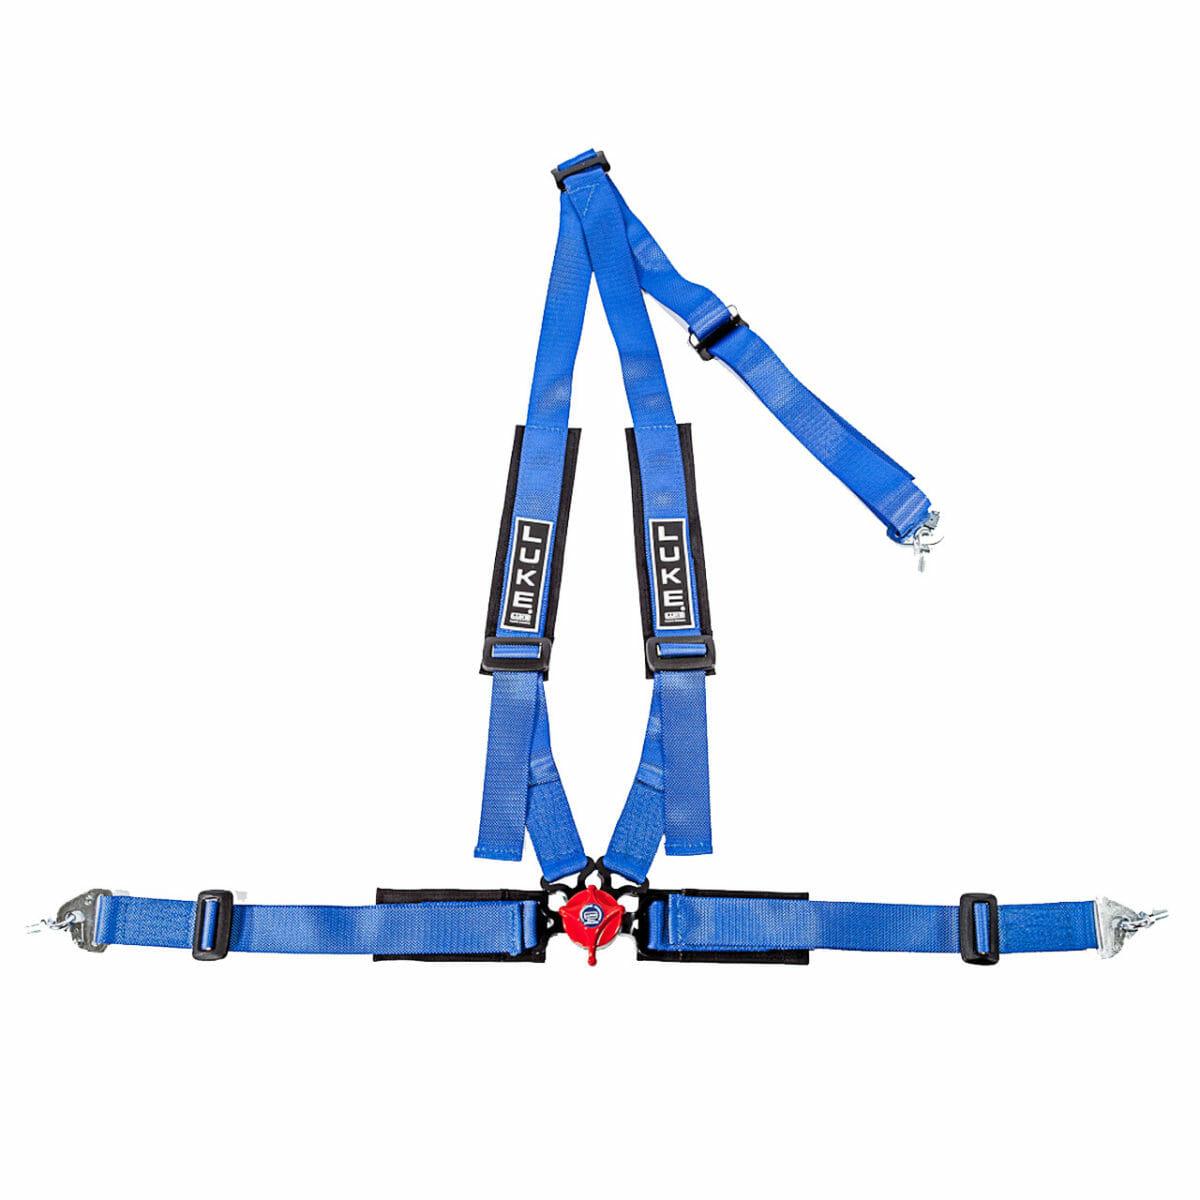 LUKE Professional 4 Point Racing Harness in Sky Blue